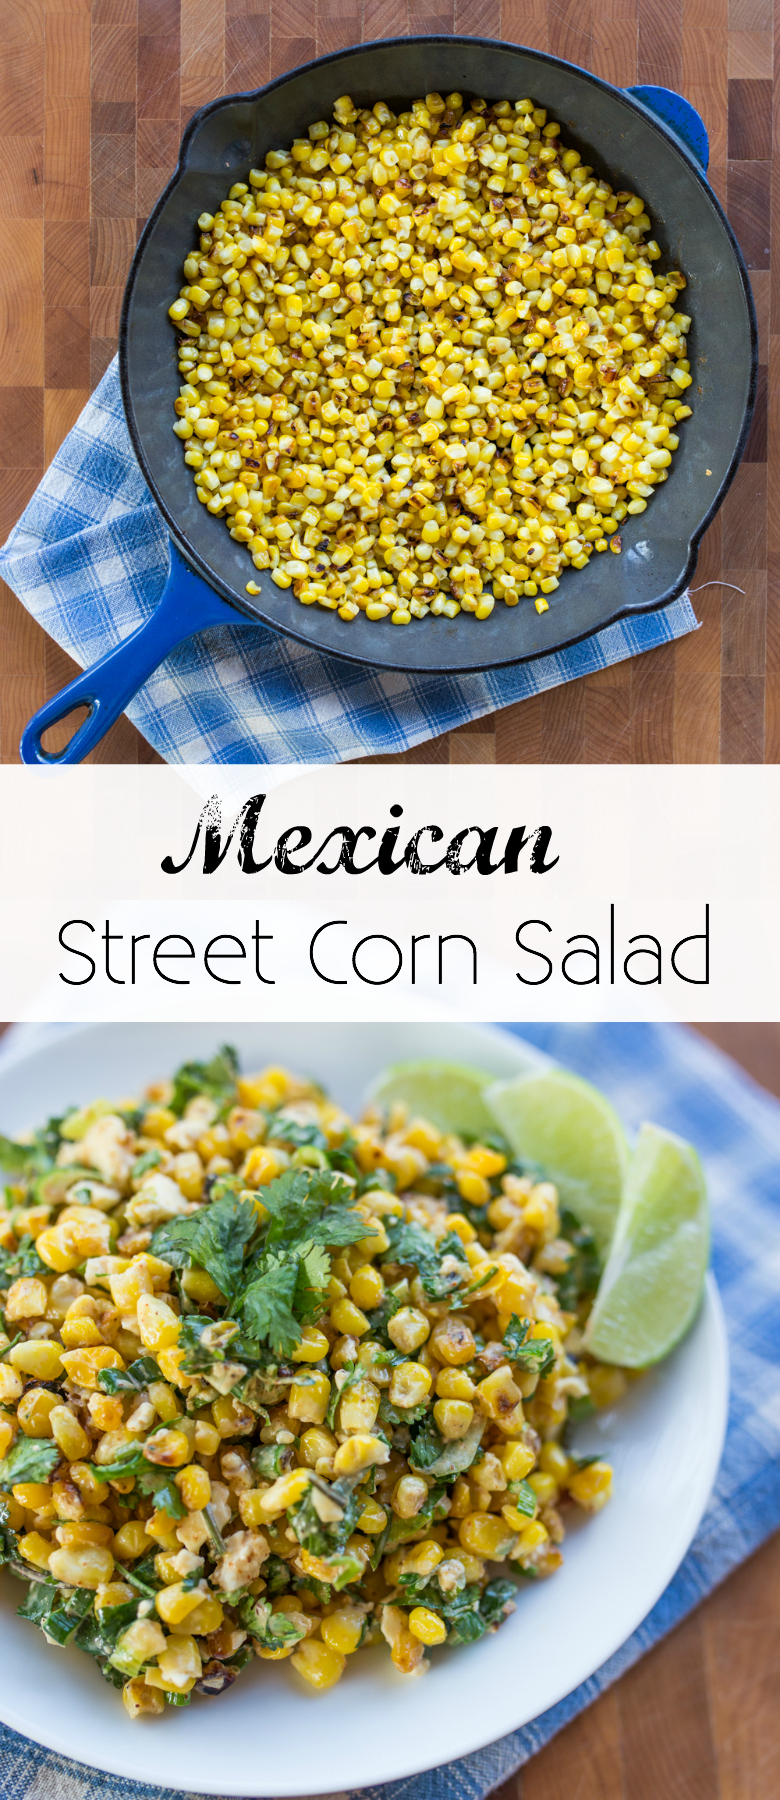 Mexican Street Corn Salad recipe